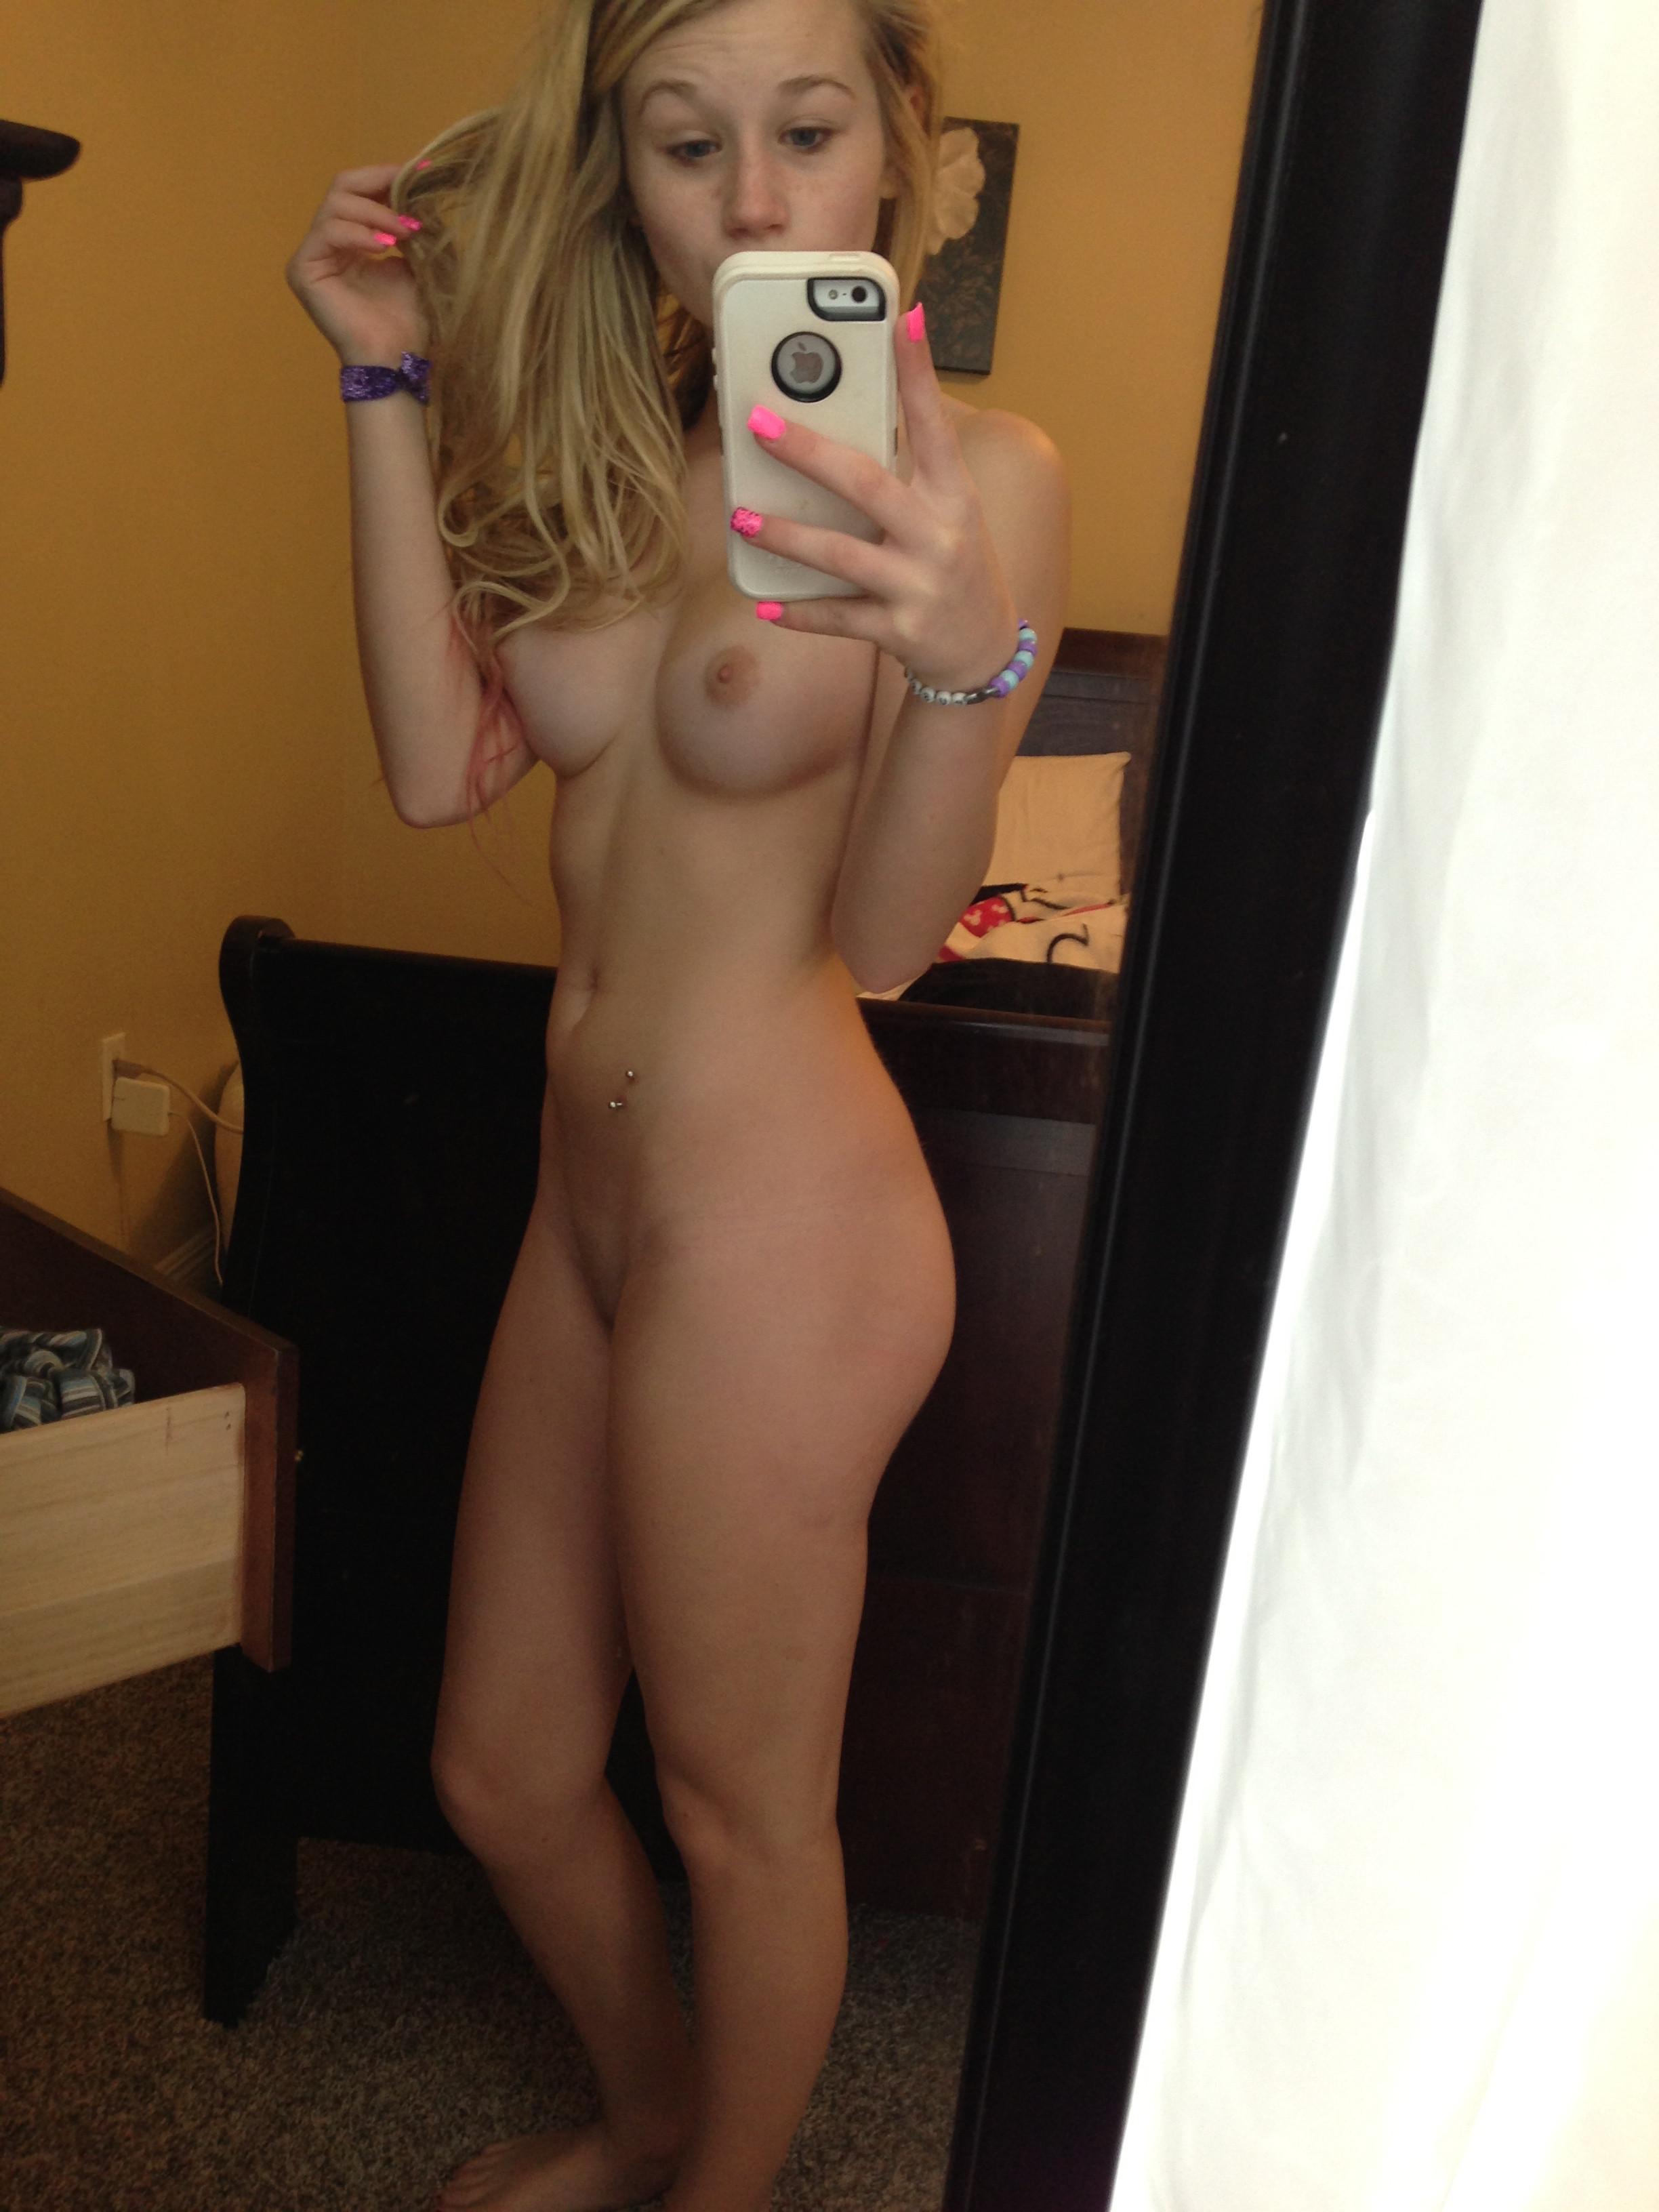 nude-selfie-mirror-girls-selfshot-young-mix-vol6-51